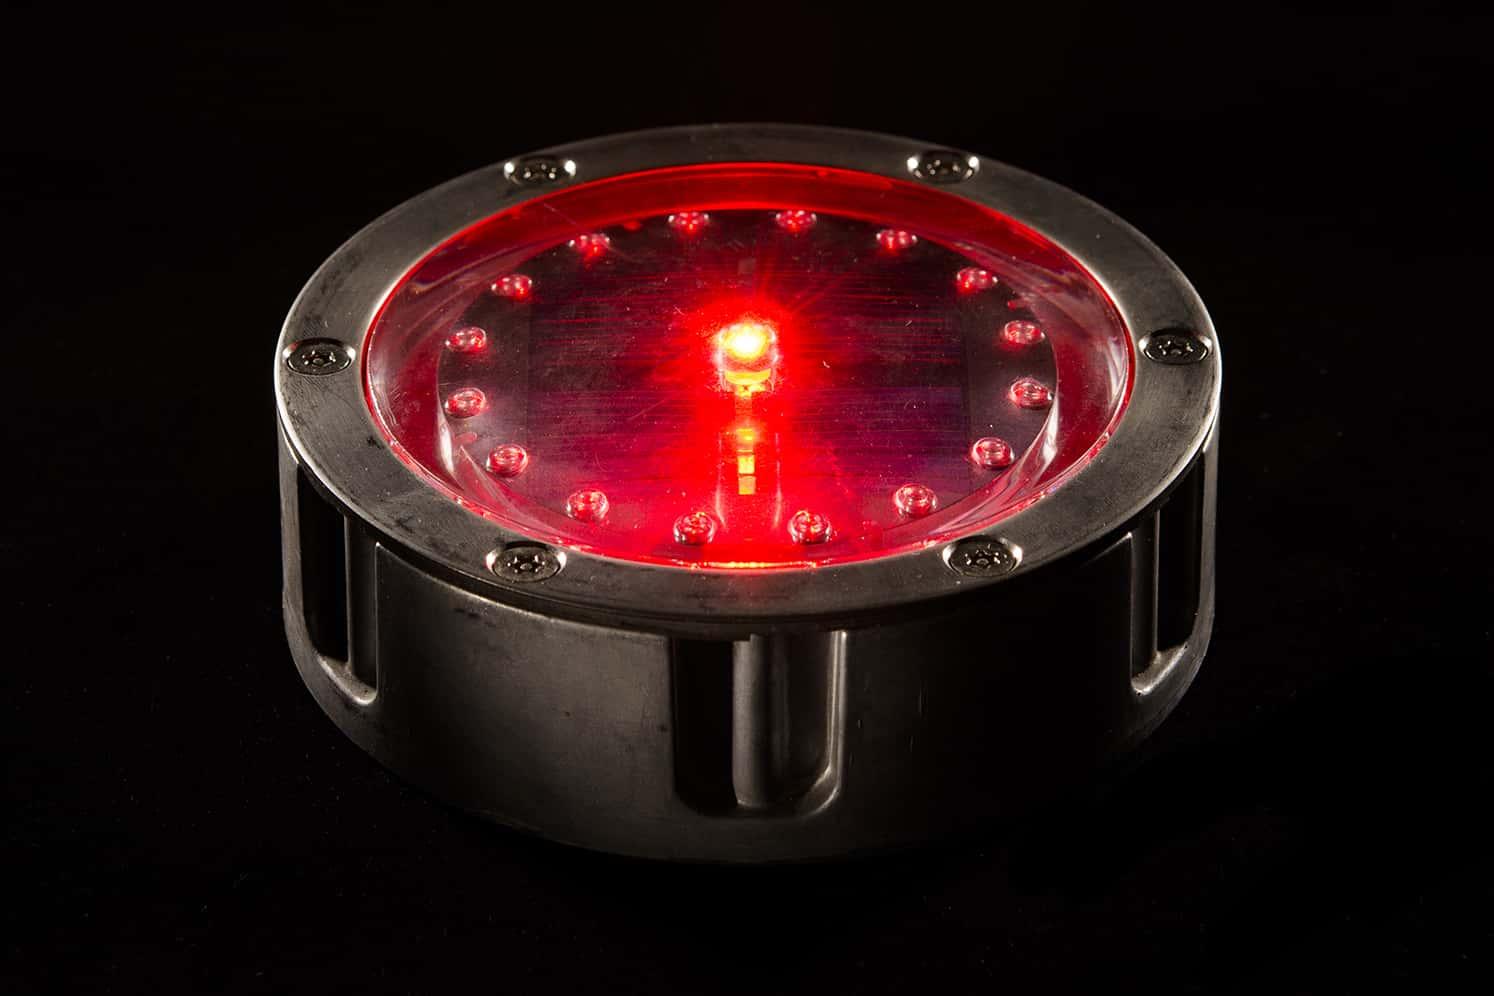 Plot solaire piste cyclable ECO-120 rouge